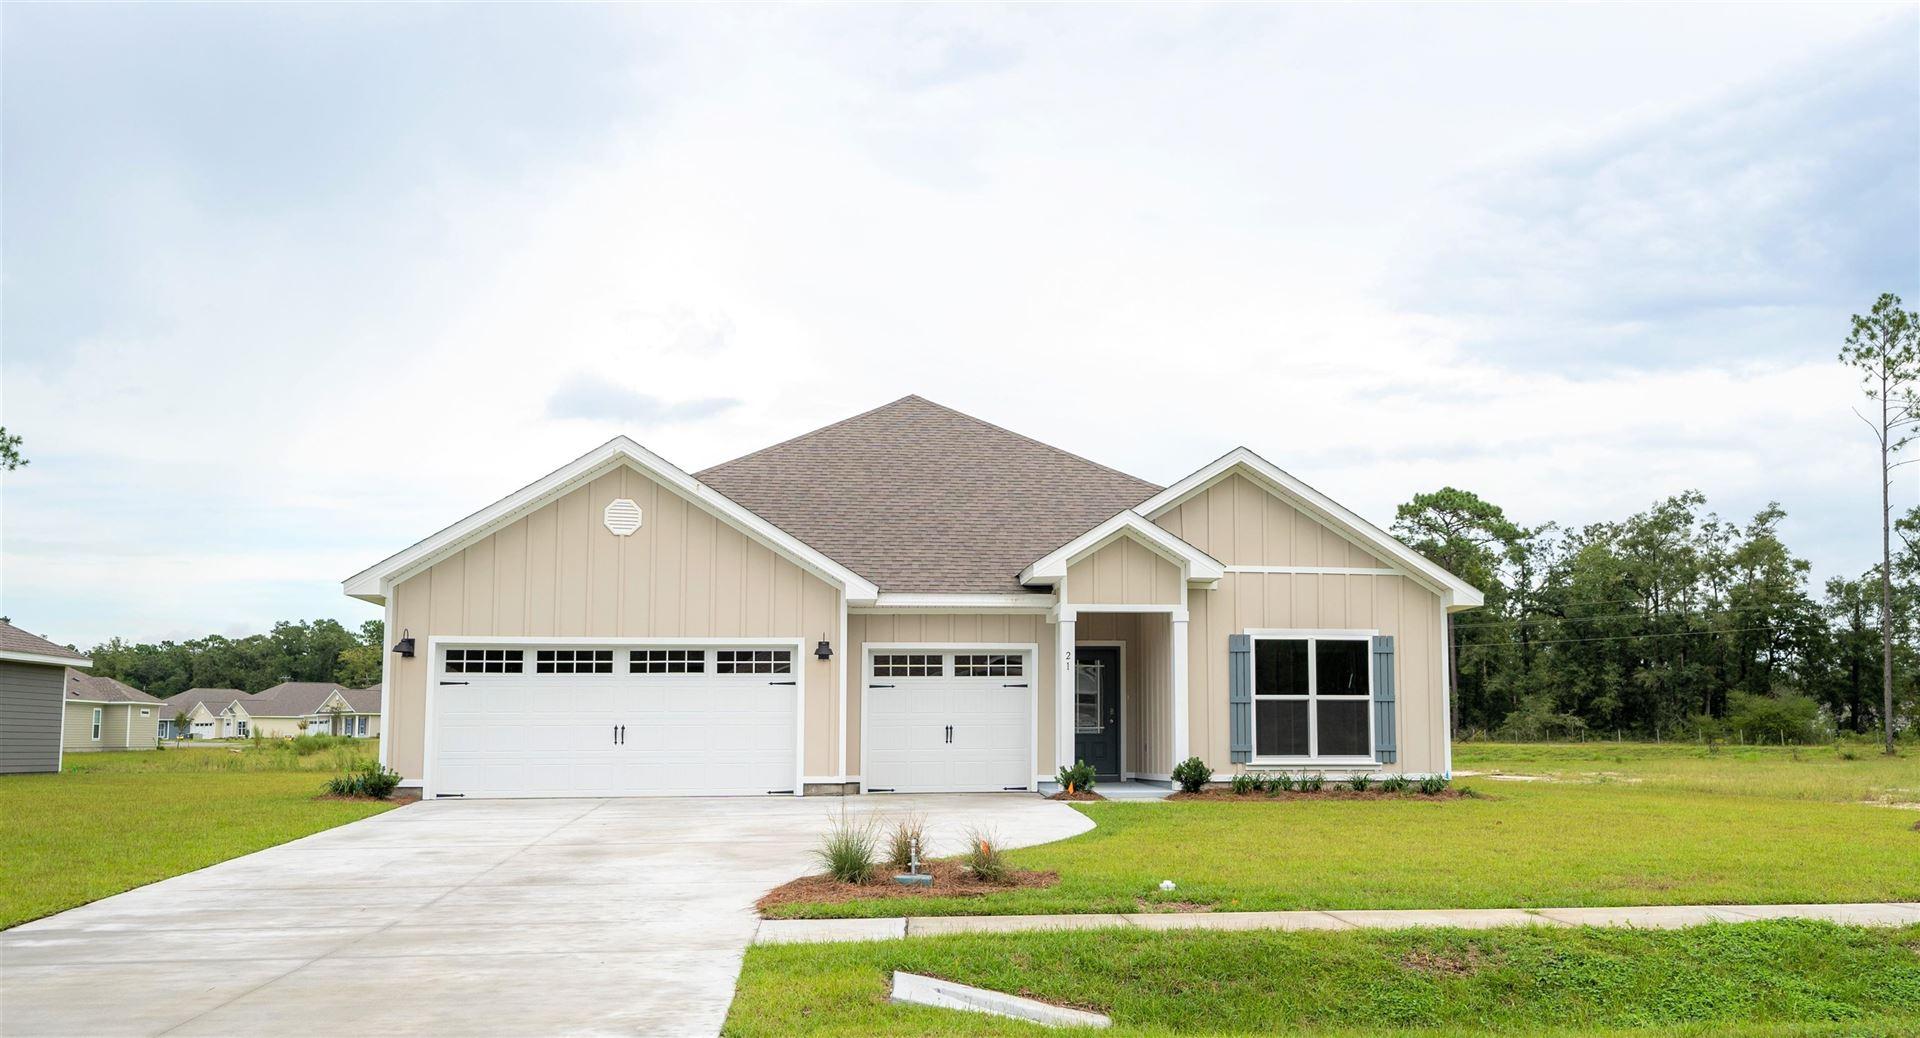 21 Manchester Drive, Crawfordville, FL 32327 - MLS#: 333614